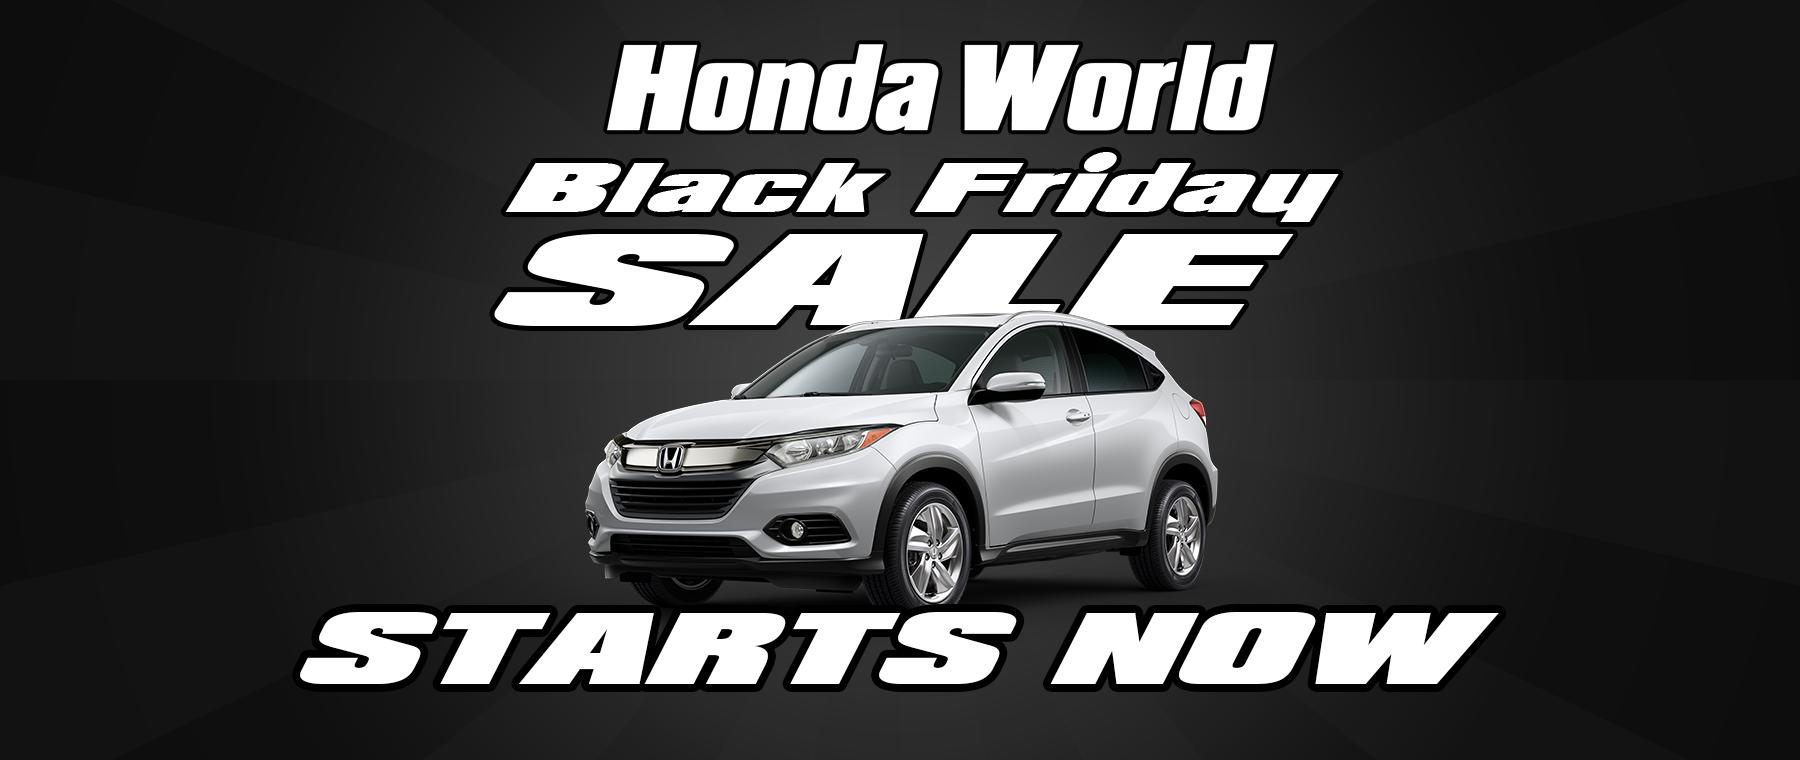 Honda Black Friday Sale Starts Now